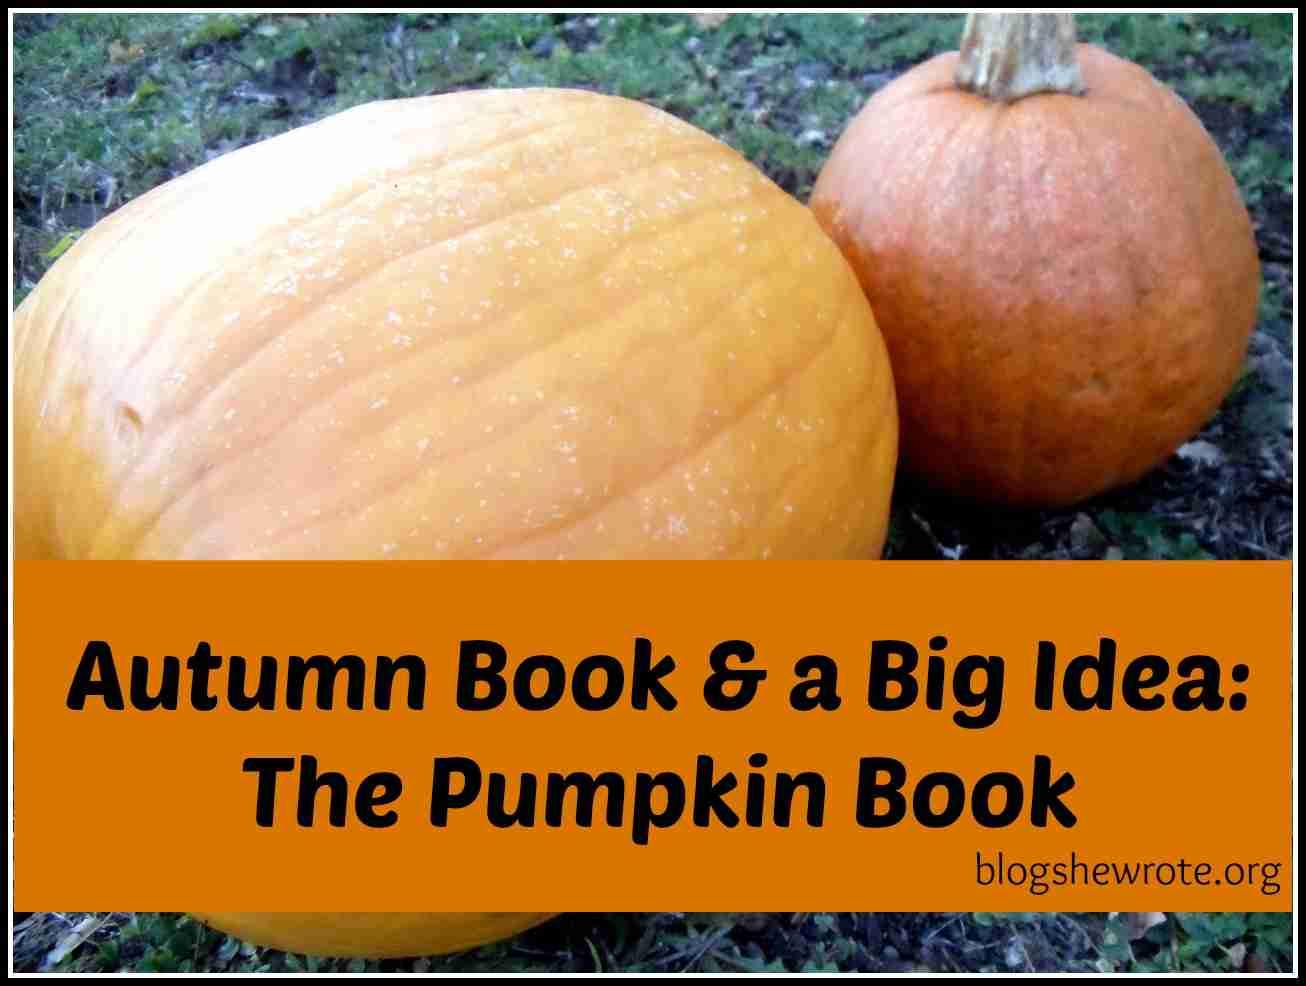 Blog, She Wrote: Autumn & a Big Idea The Pumpkin Book